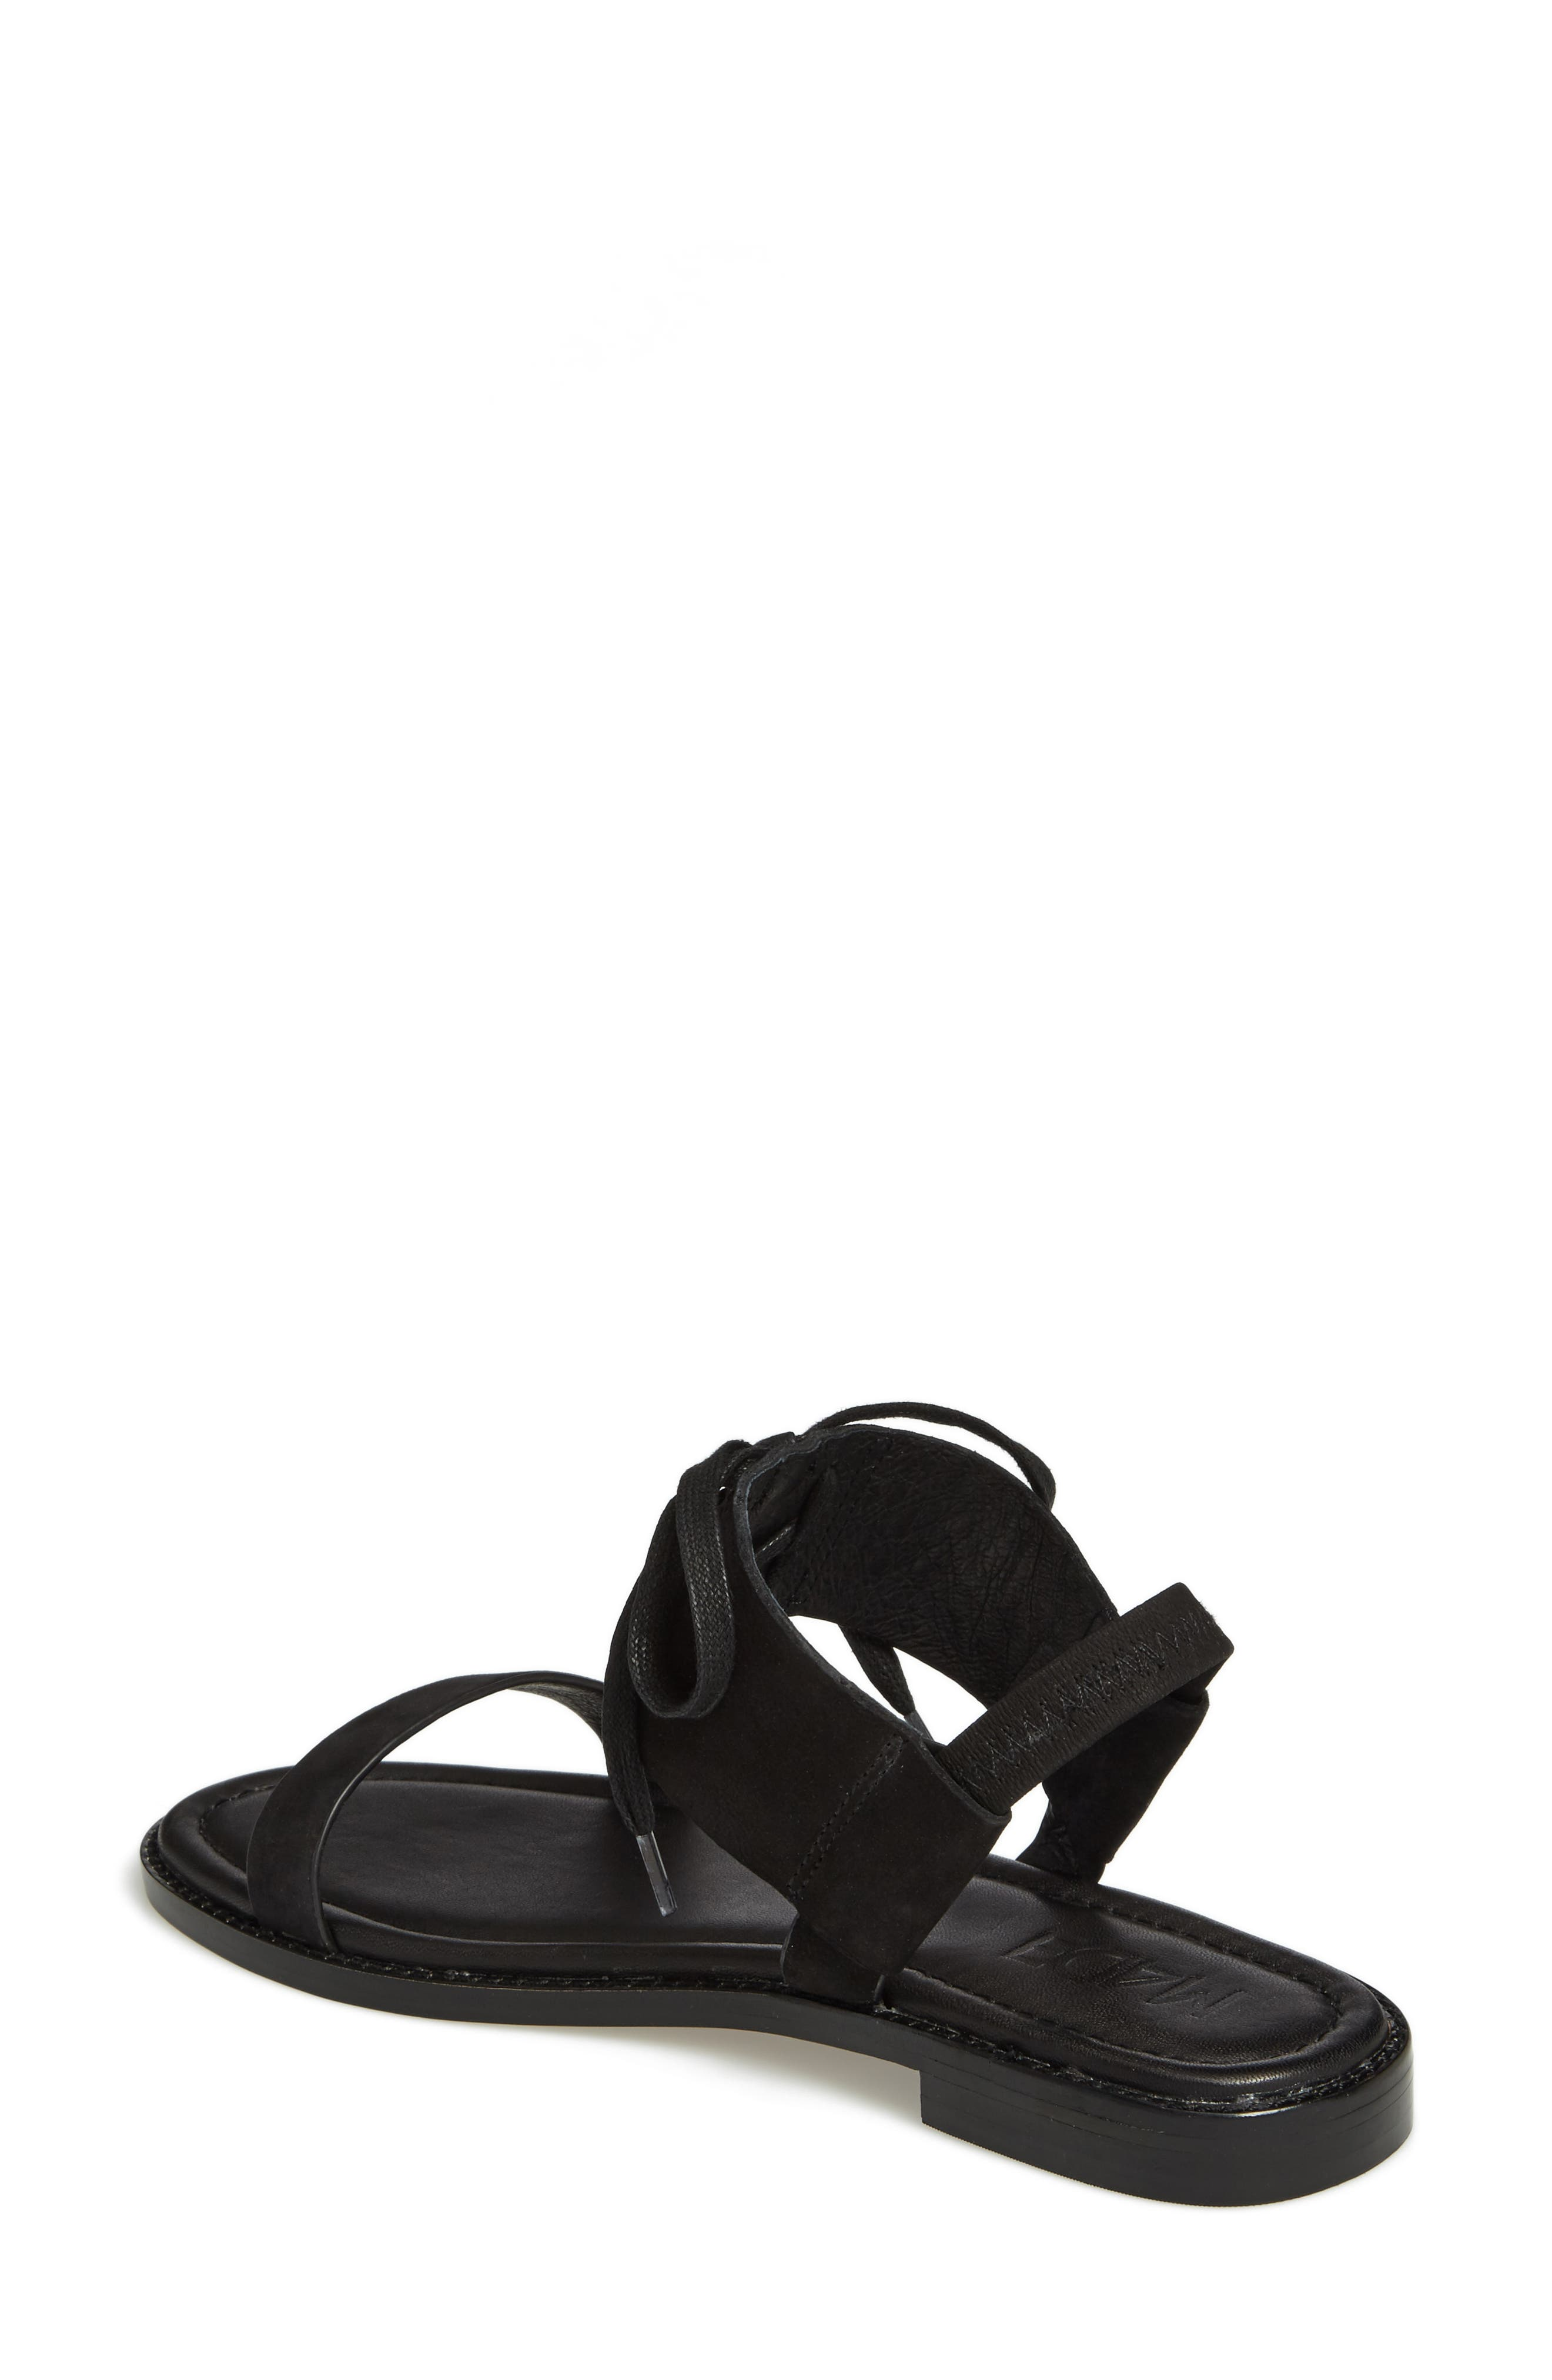 M4D3 Hailey Slingback Sandal,                             Alternate thumbnail 2, color,                             001